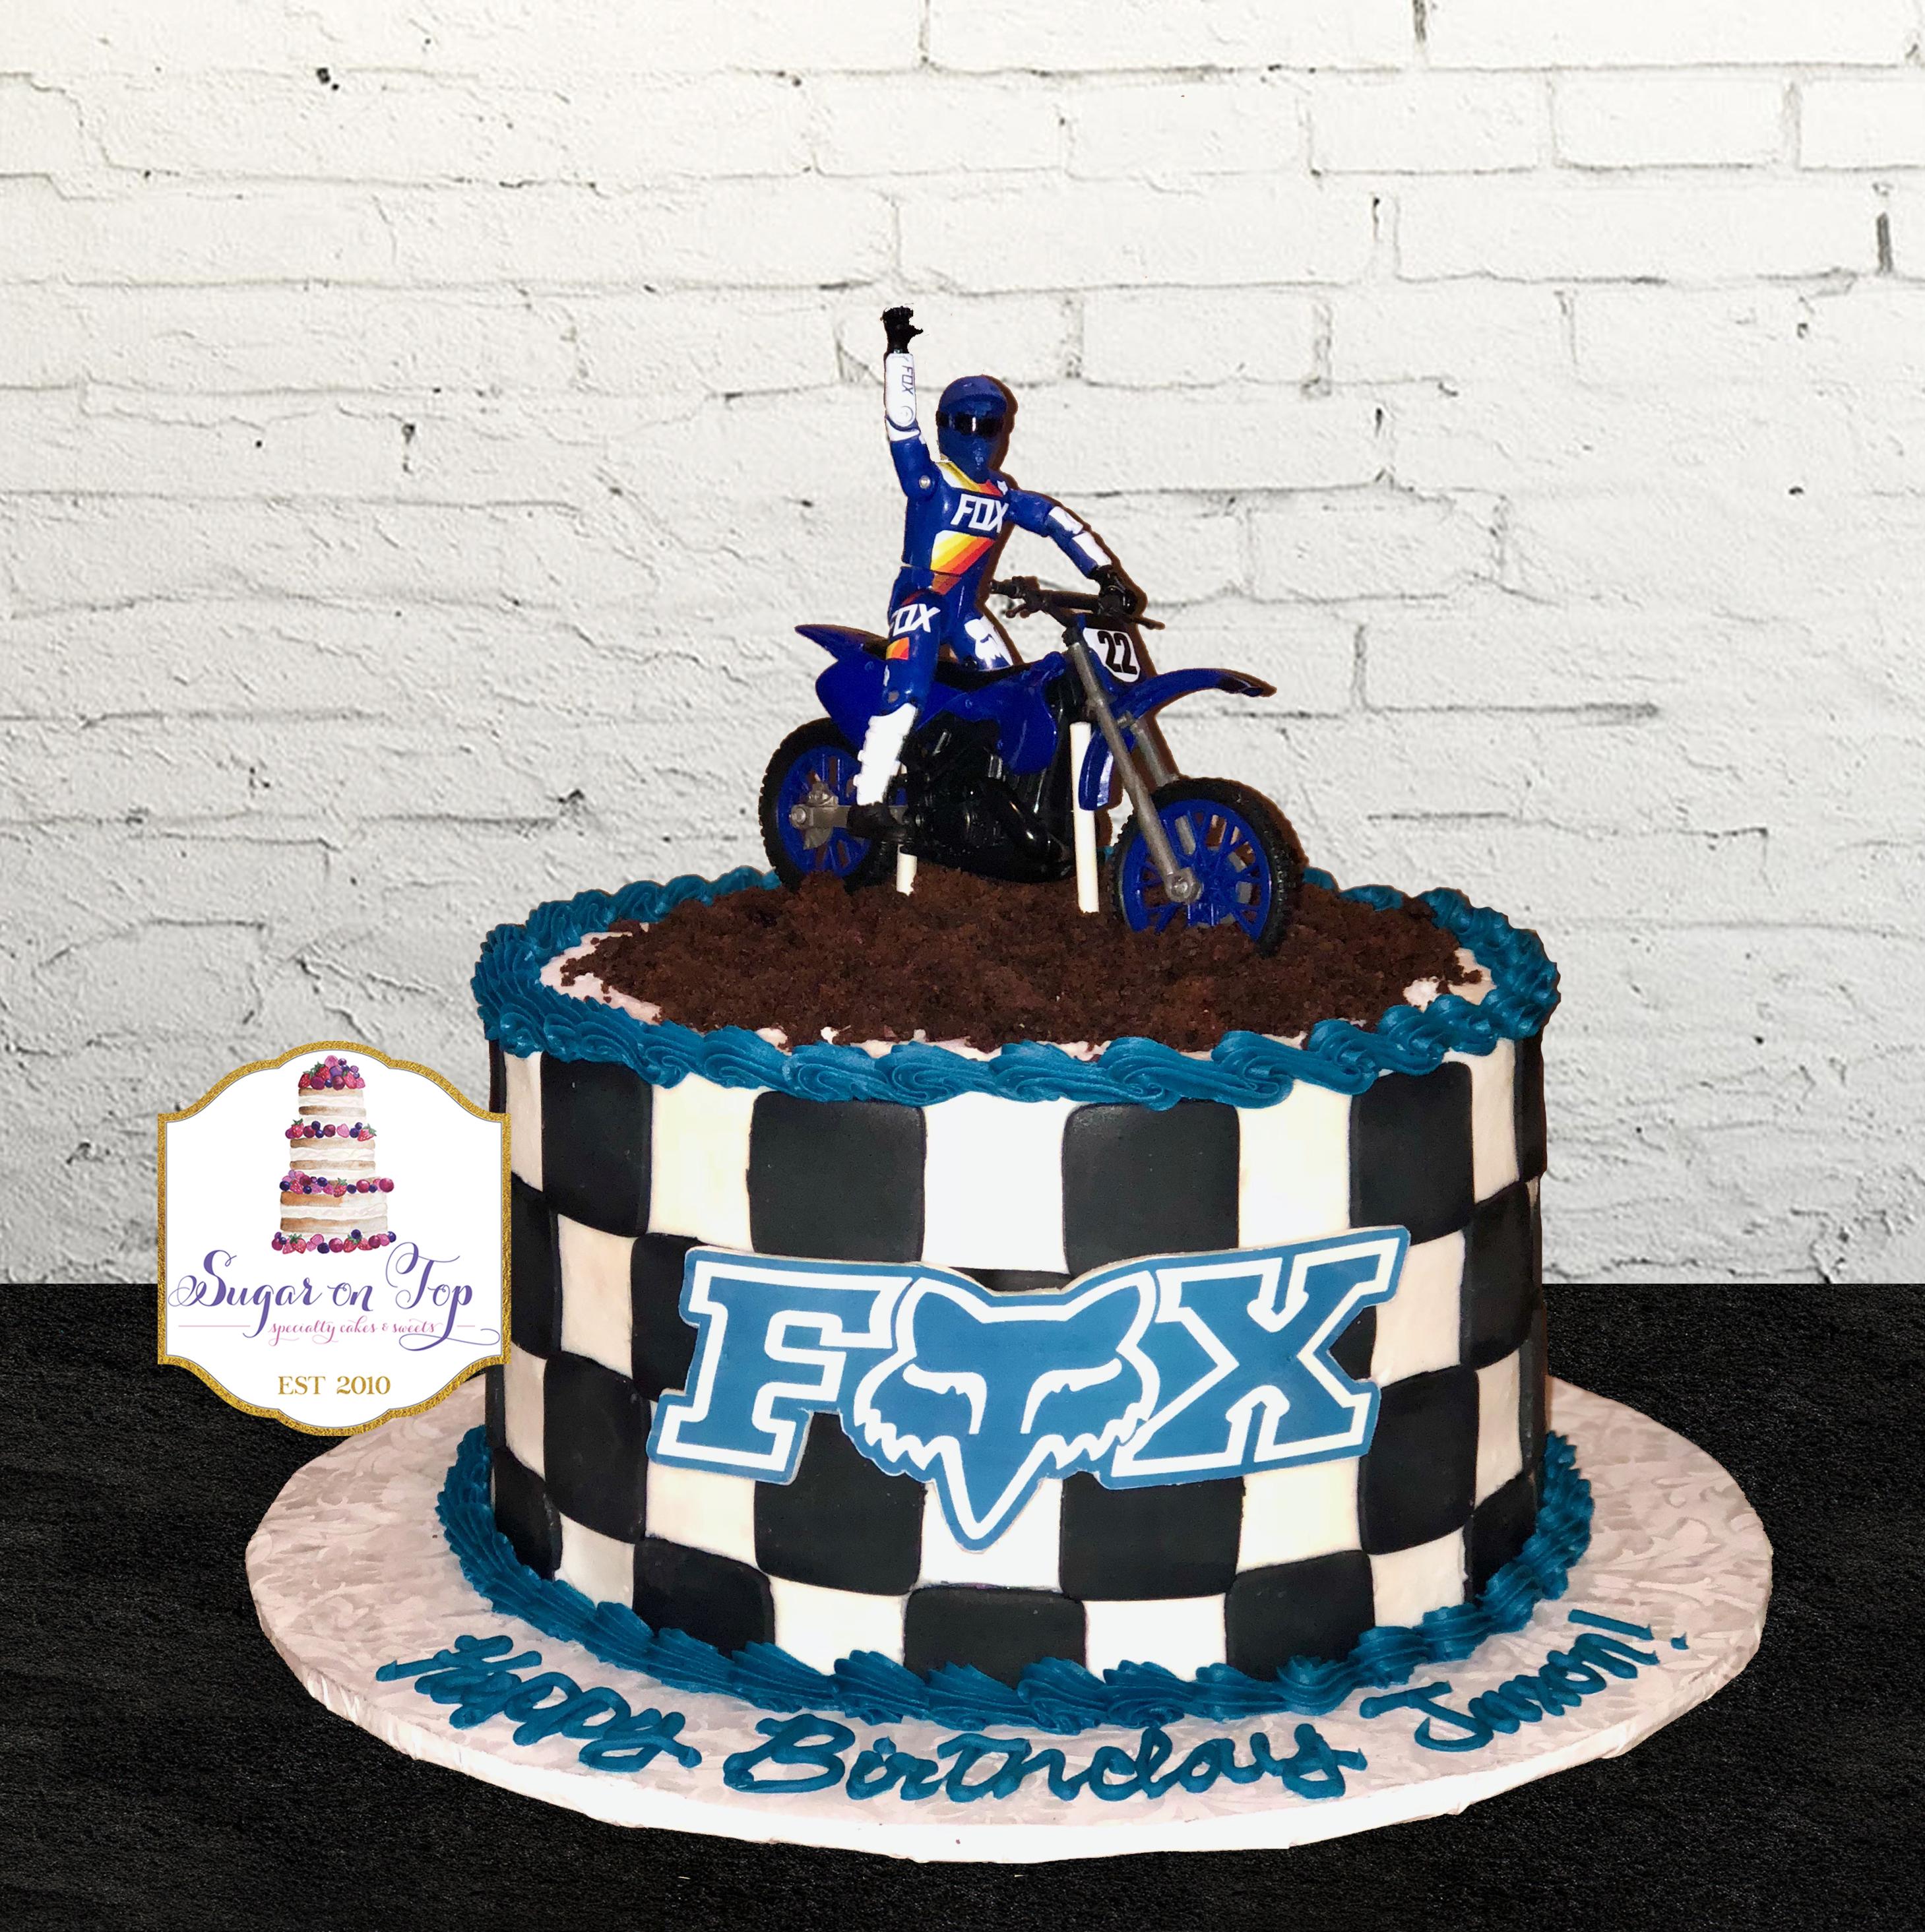 FOX racing cake